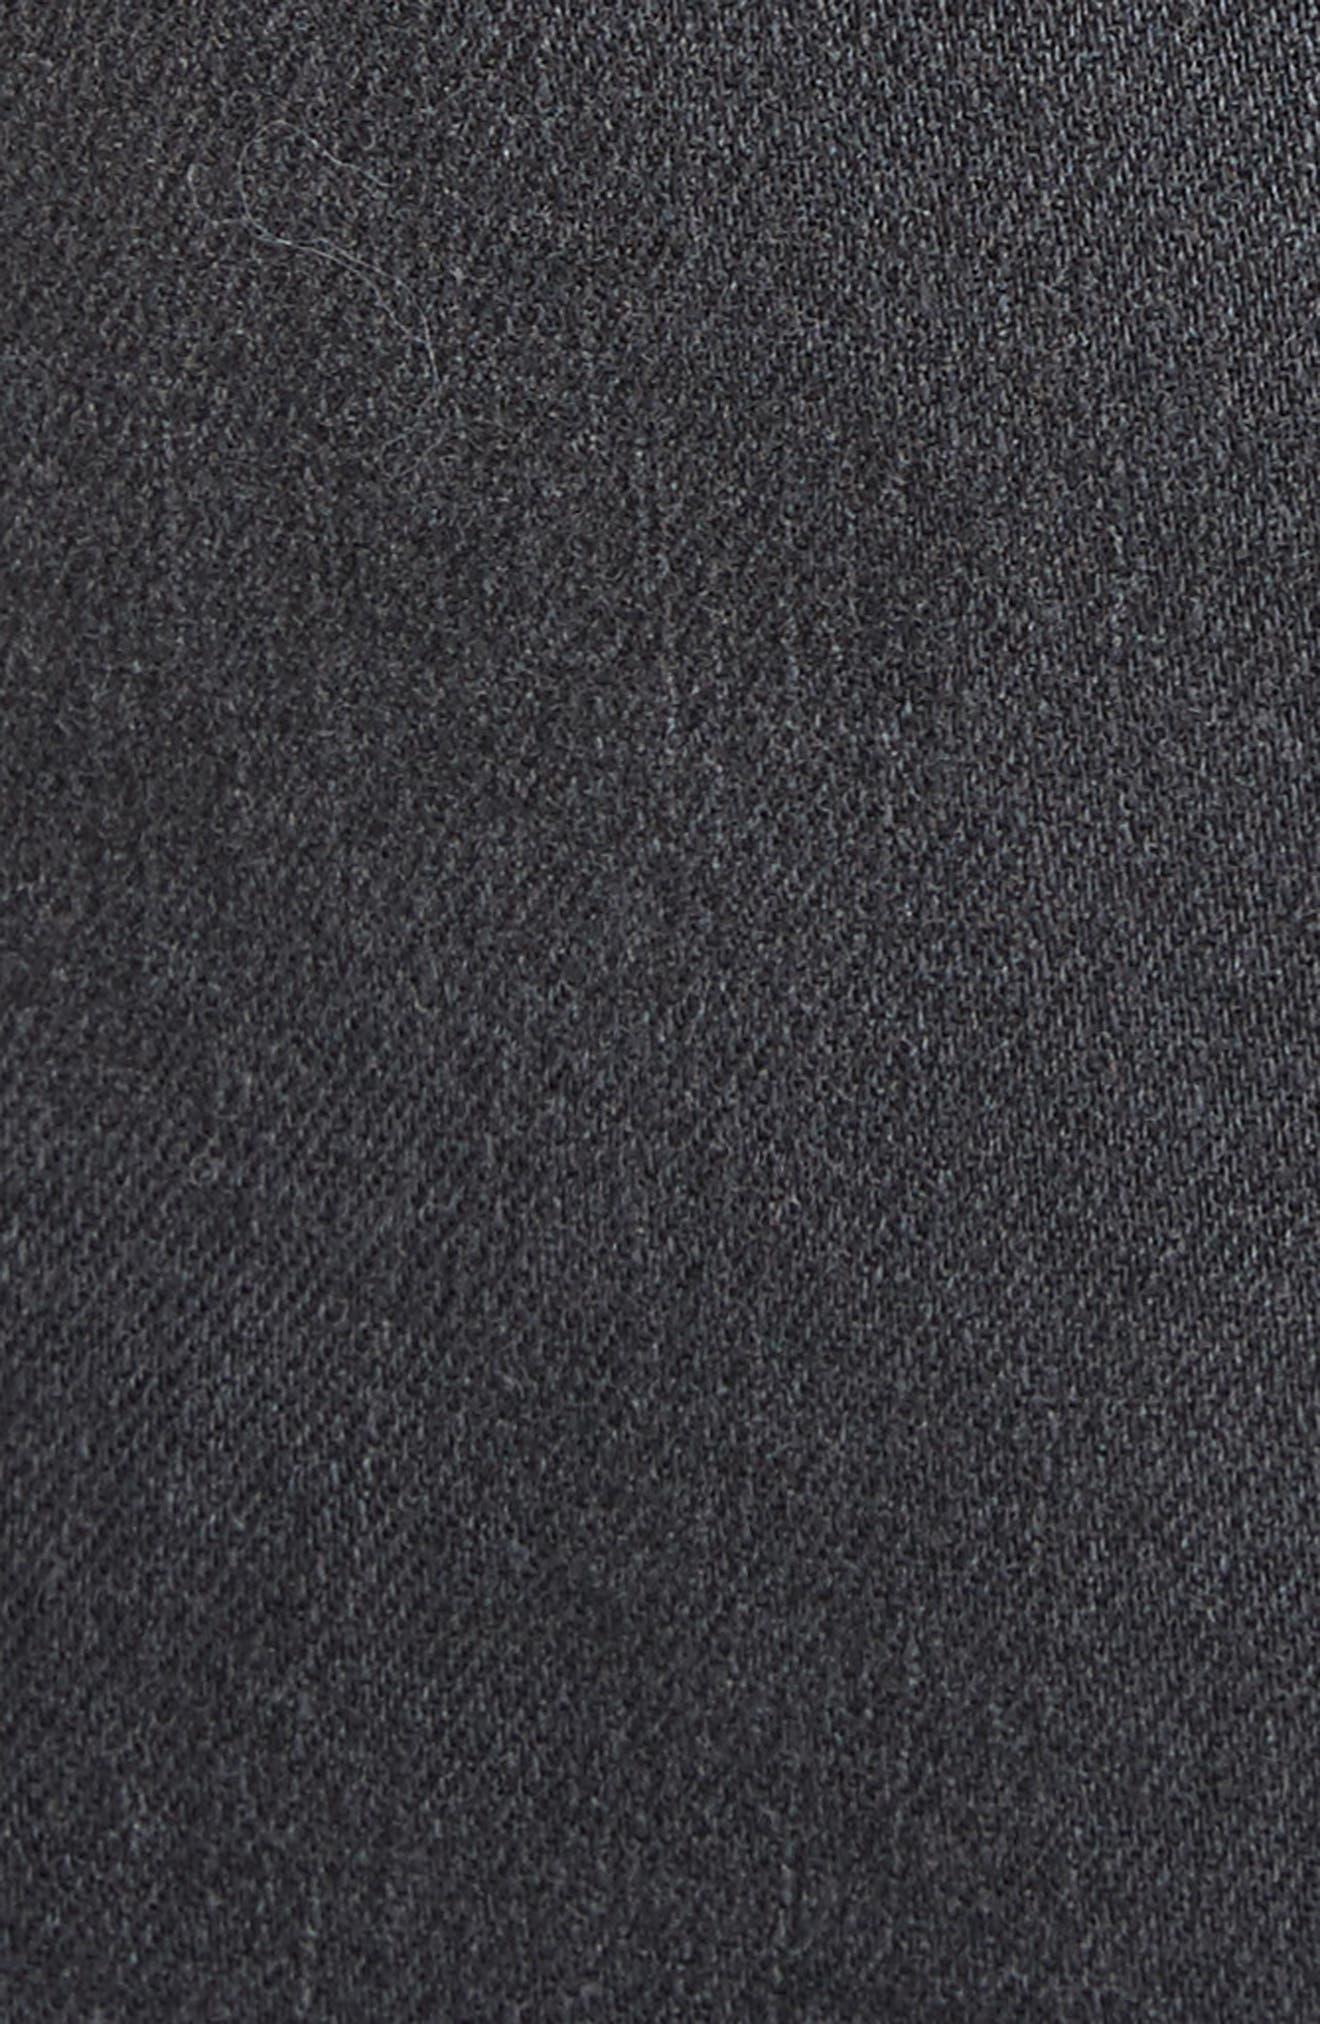 Portia Lace Up Denim Skirt,                             Alternate thumbnail 5, color,                             006